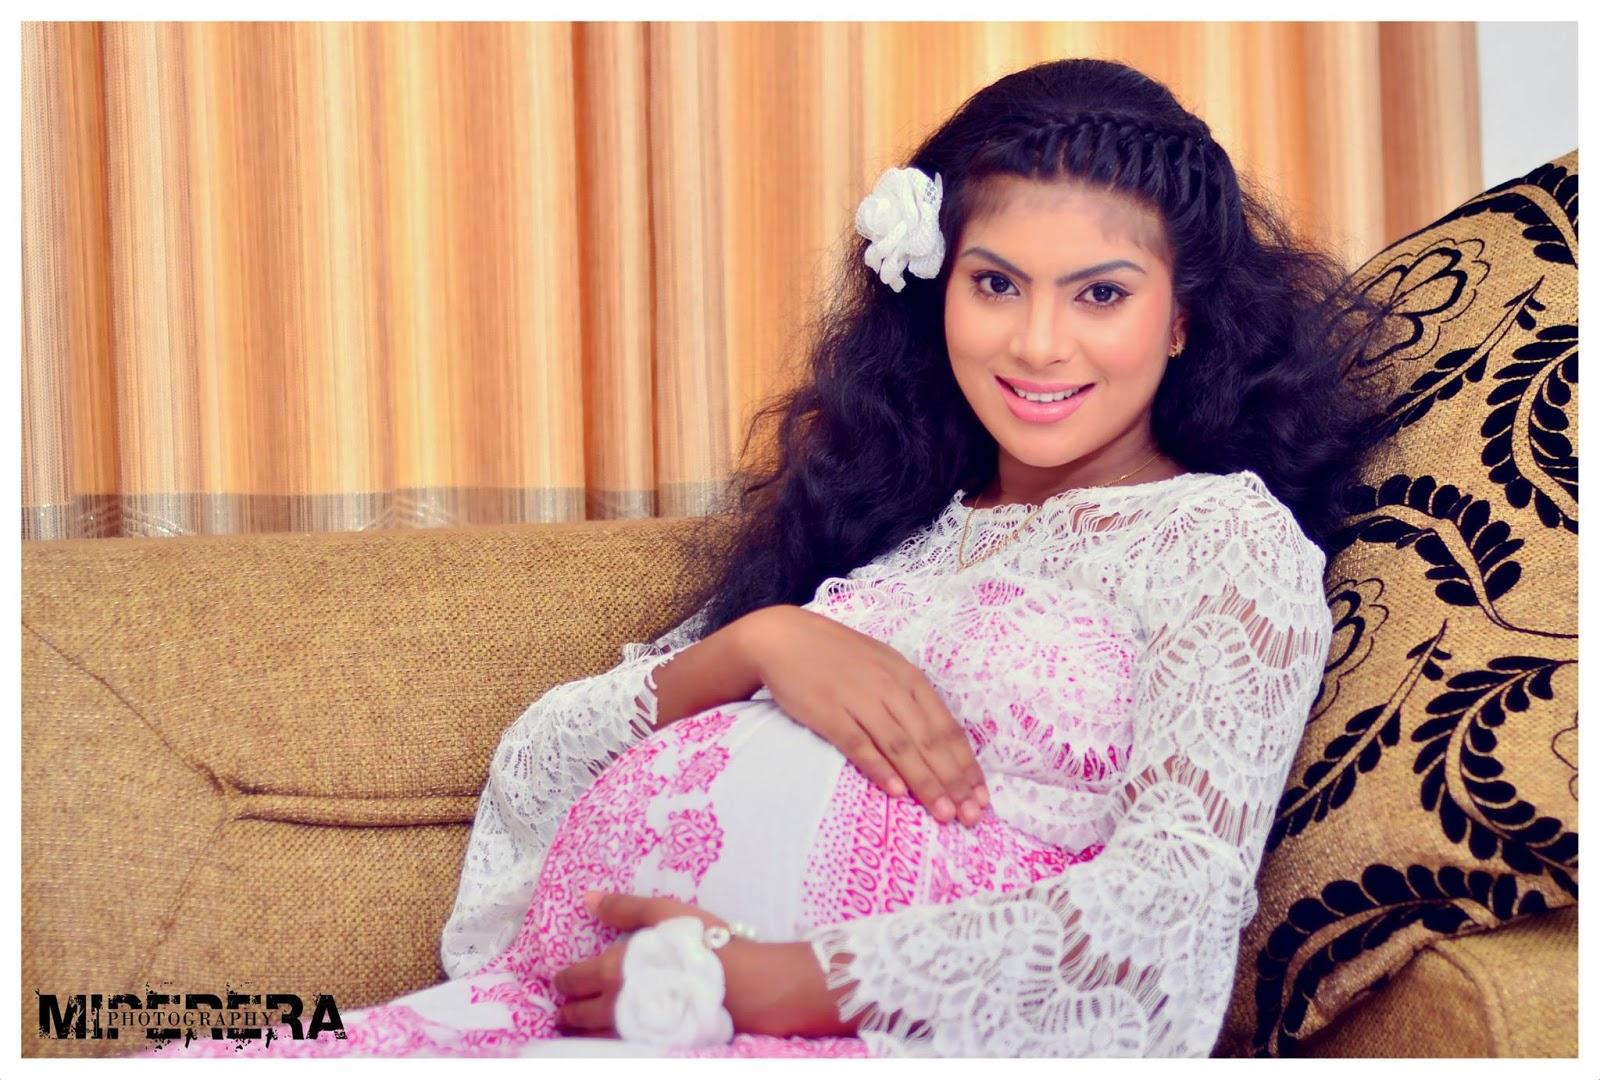 Sri lankan pregnant 6 months shaved 5